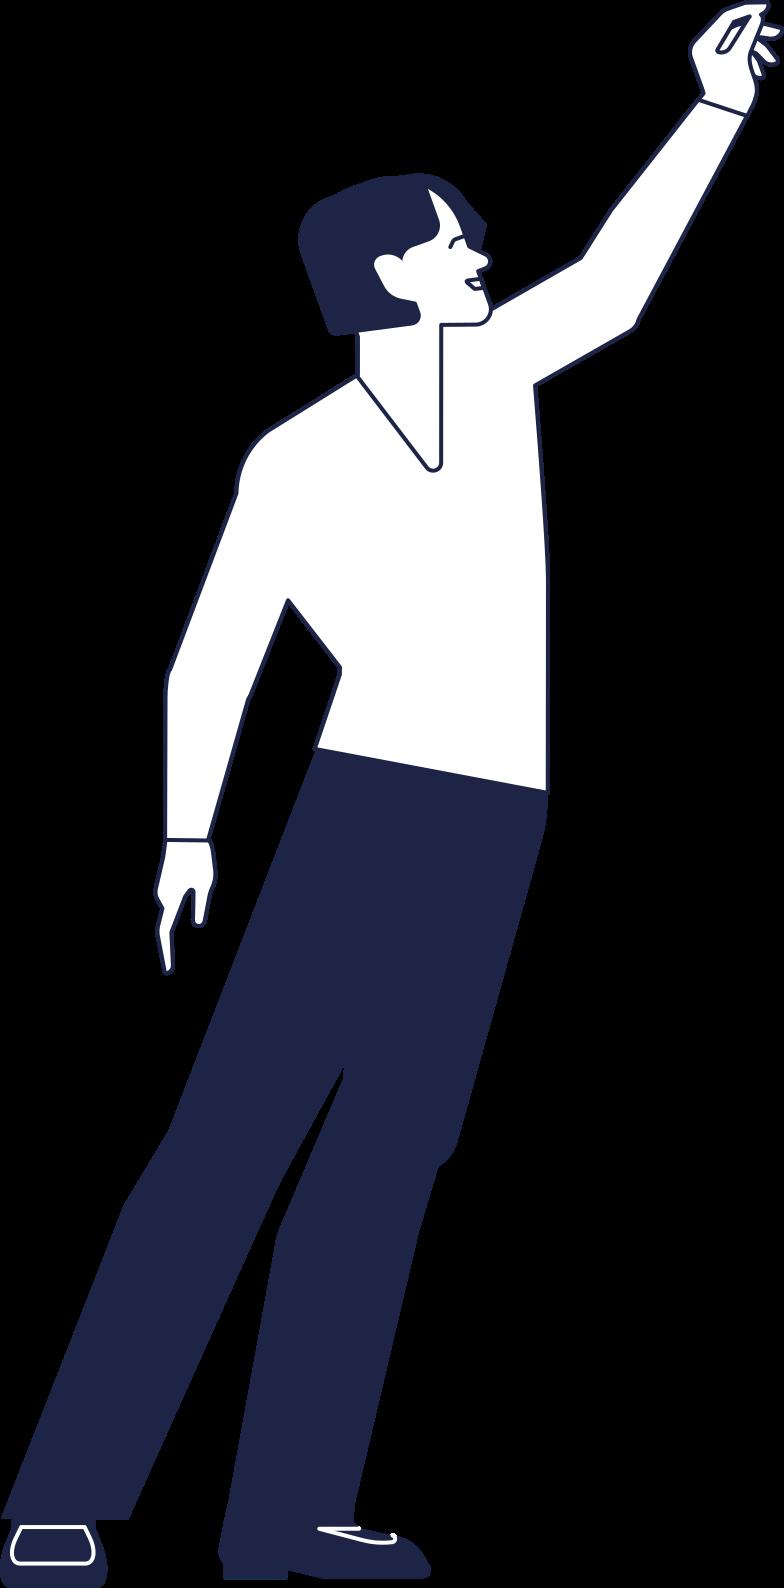 Homem com a mão levantada Clipart illustration in PNG, SVG